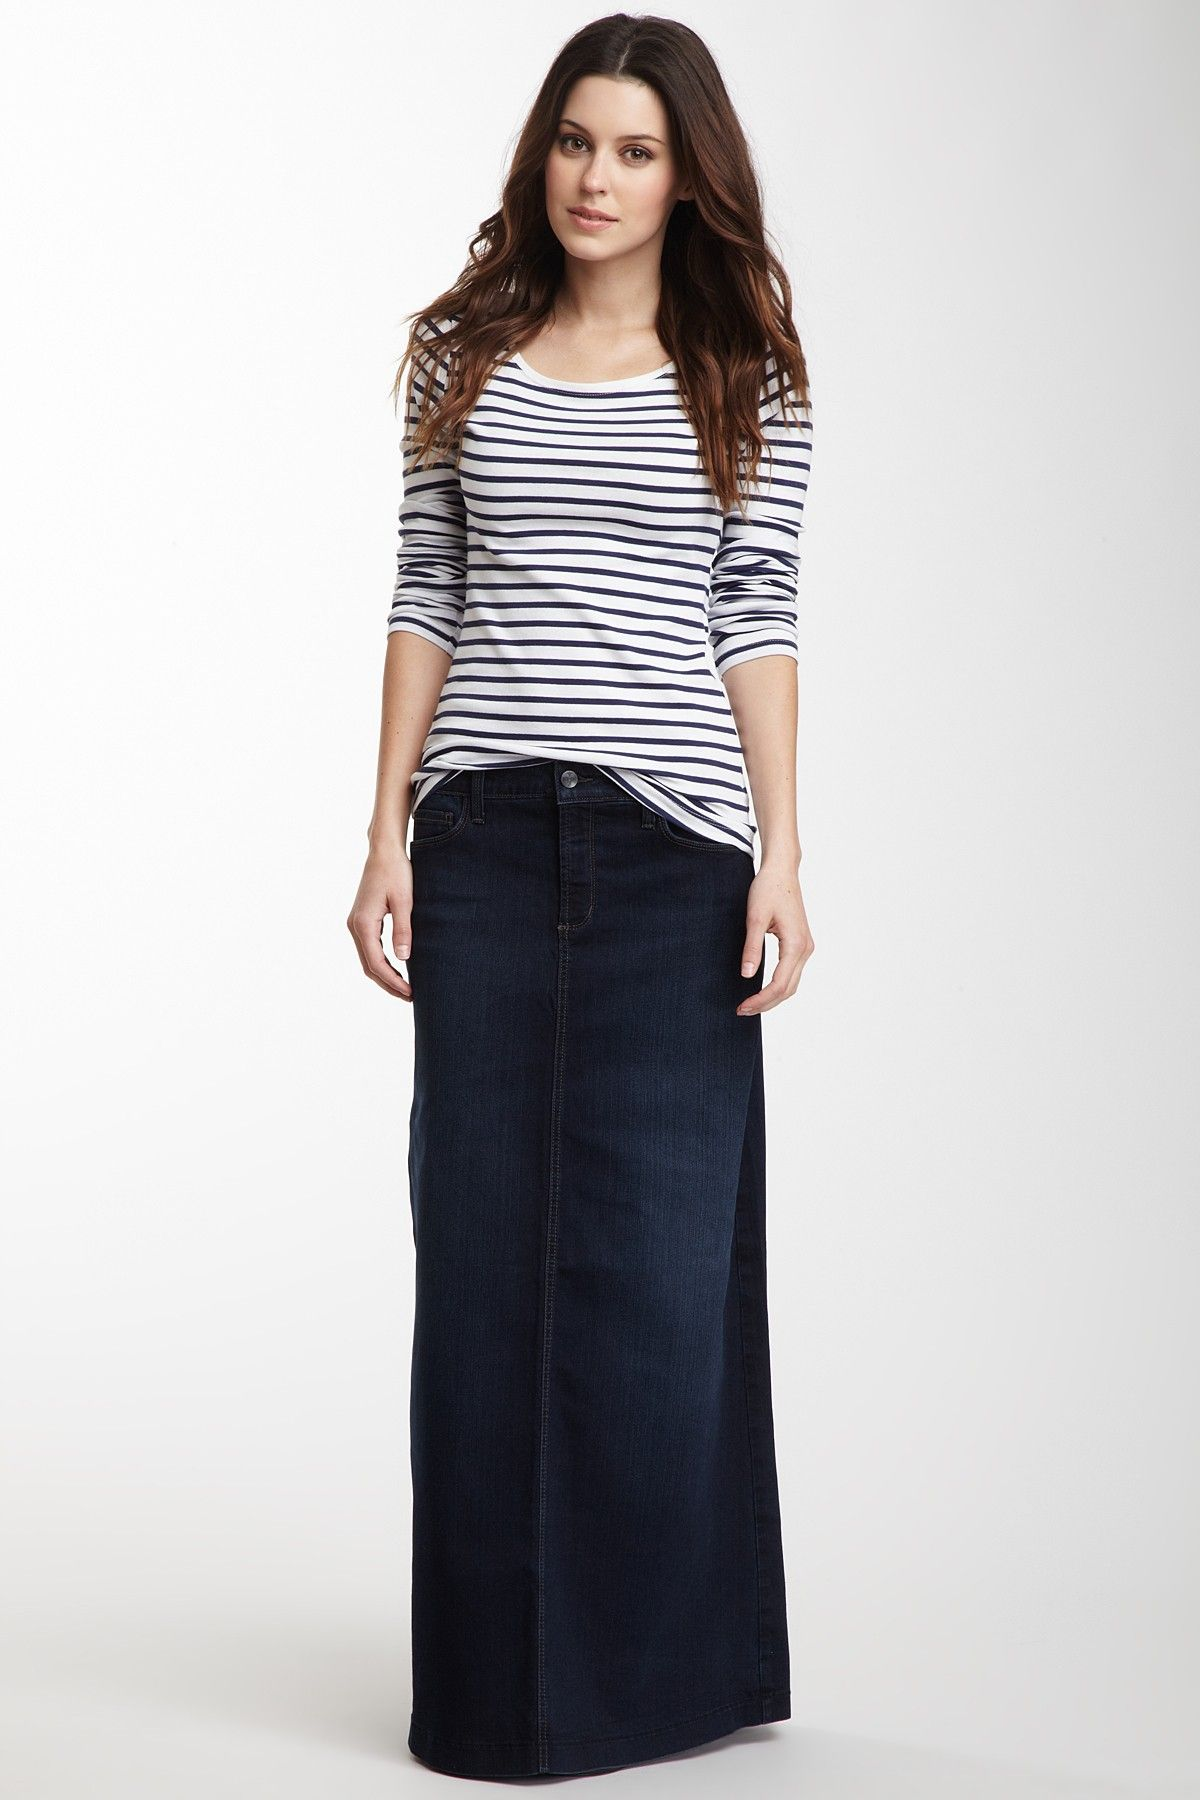 79ab641a0c Modest long jean skirt. Denim skirt | Modest Fashion Ideas | Denim ...